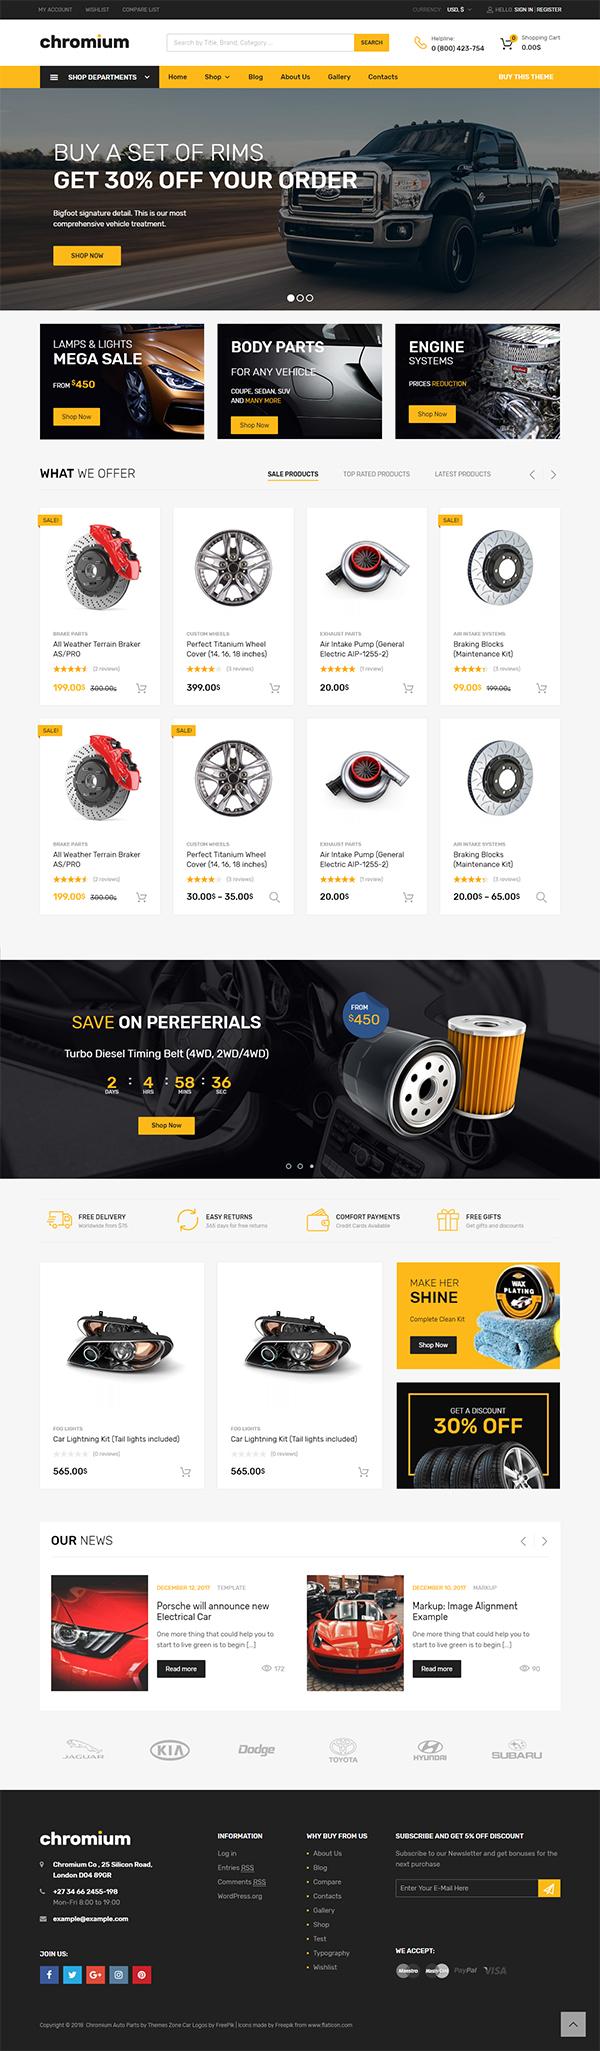 Chromium – Auto Parts Shop WordPress WooCommerce Theme